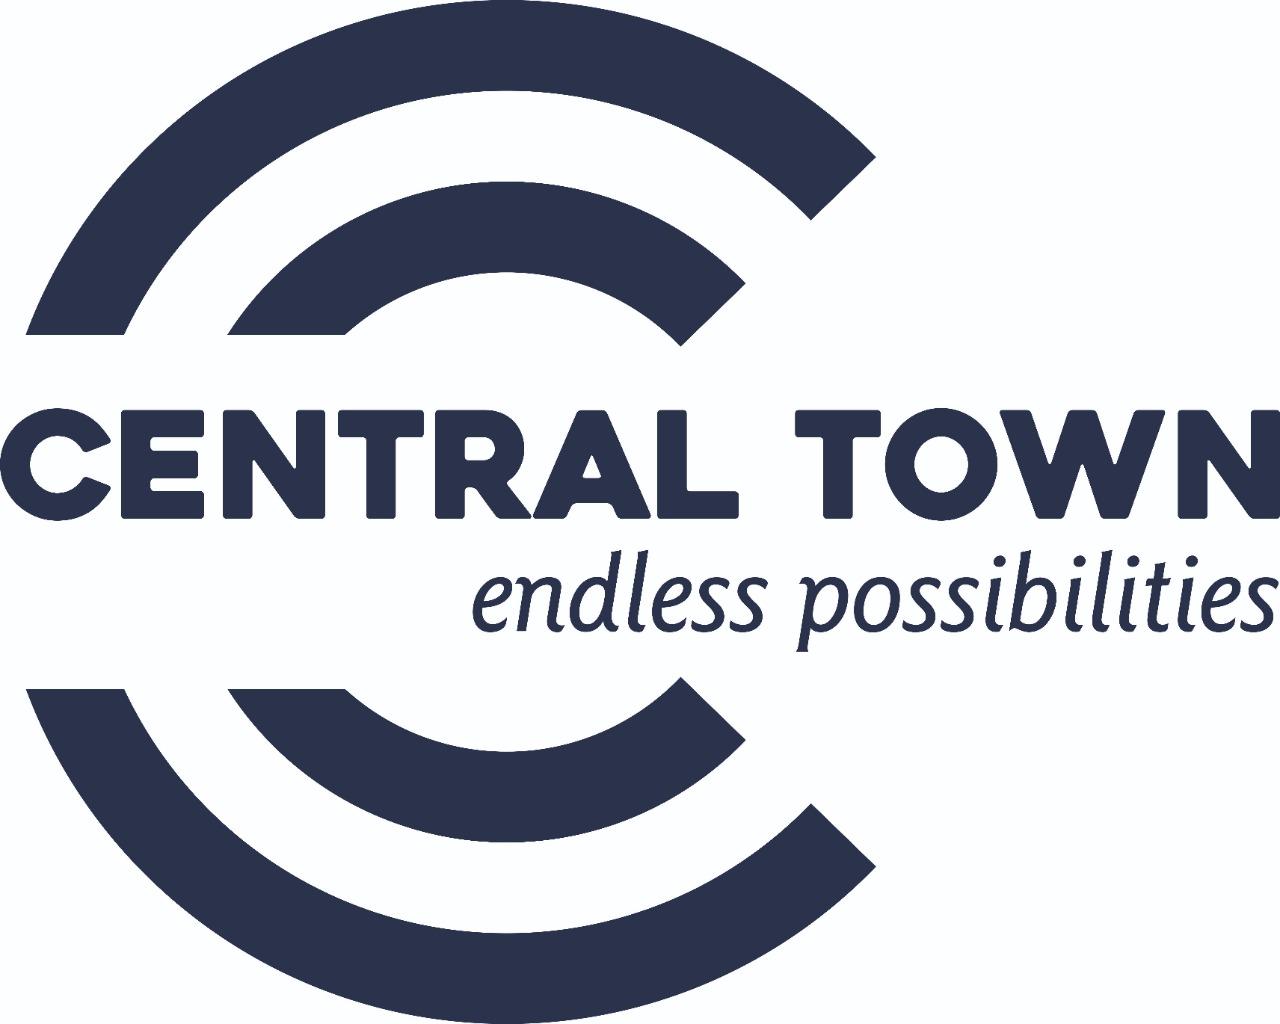 Central Town Chandigarh